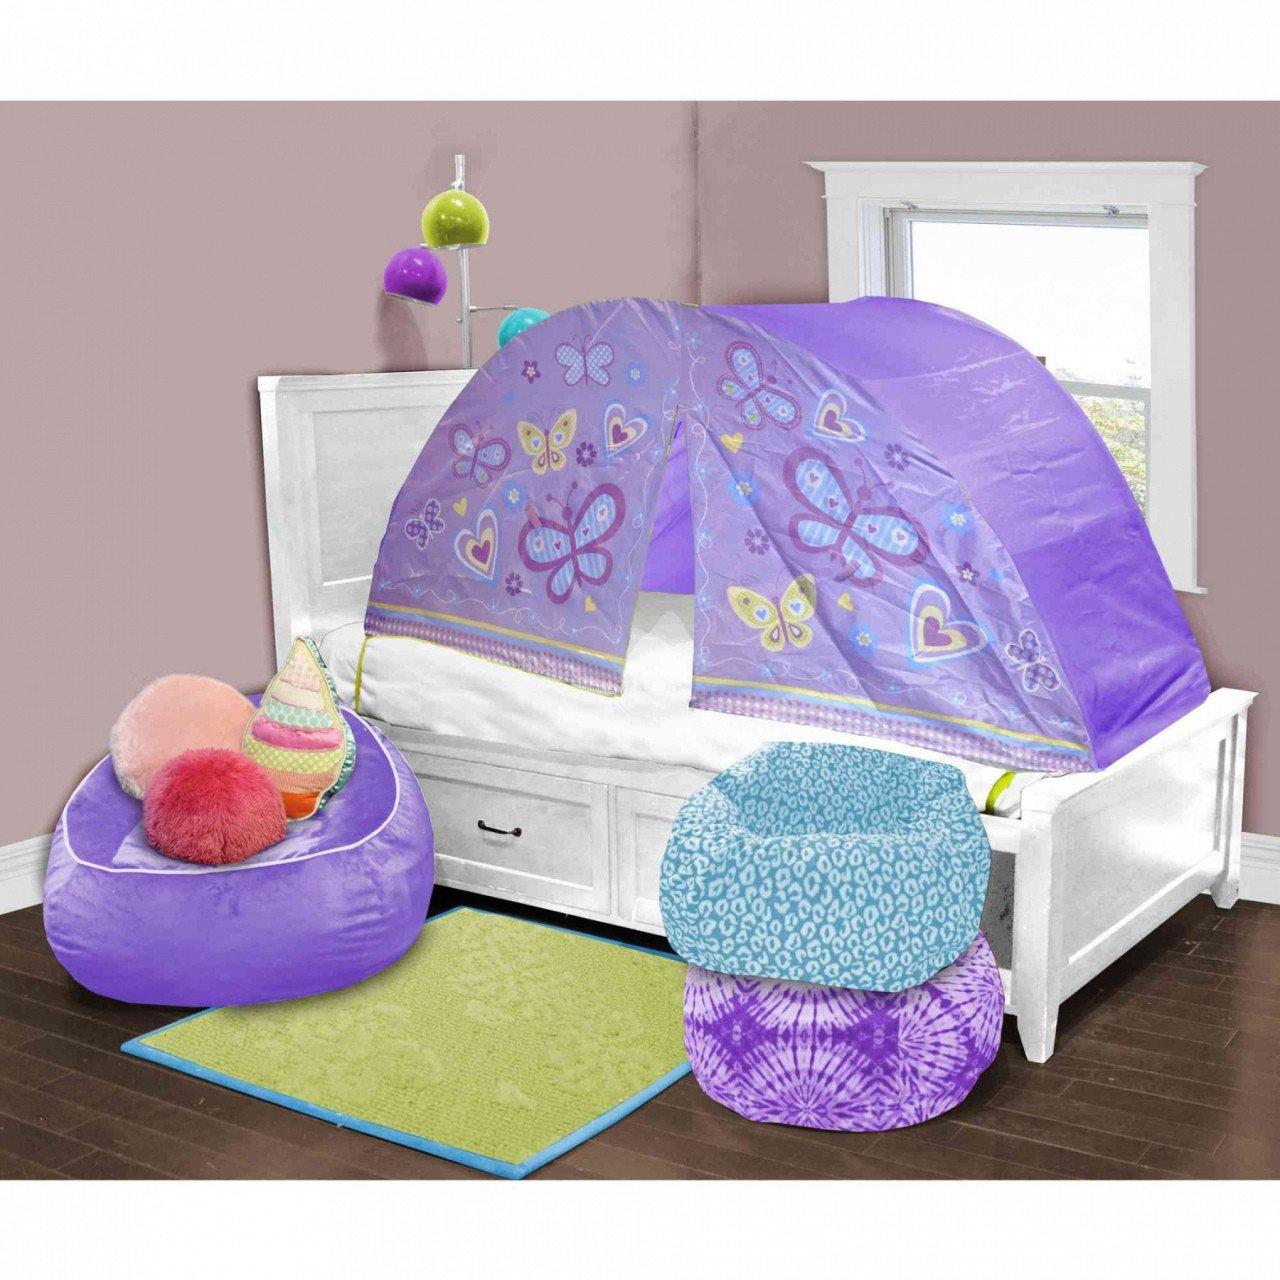 Little Girl Bedroom Decor Luxury Ikea Kids Bed — Procura Home Blog